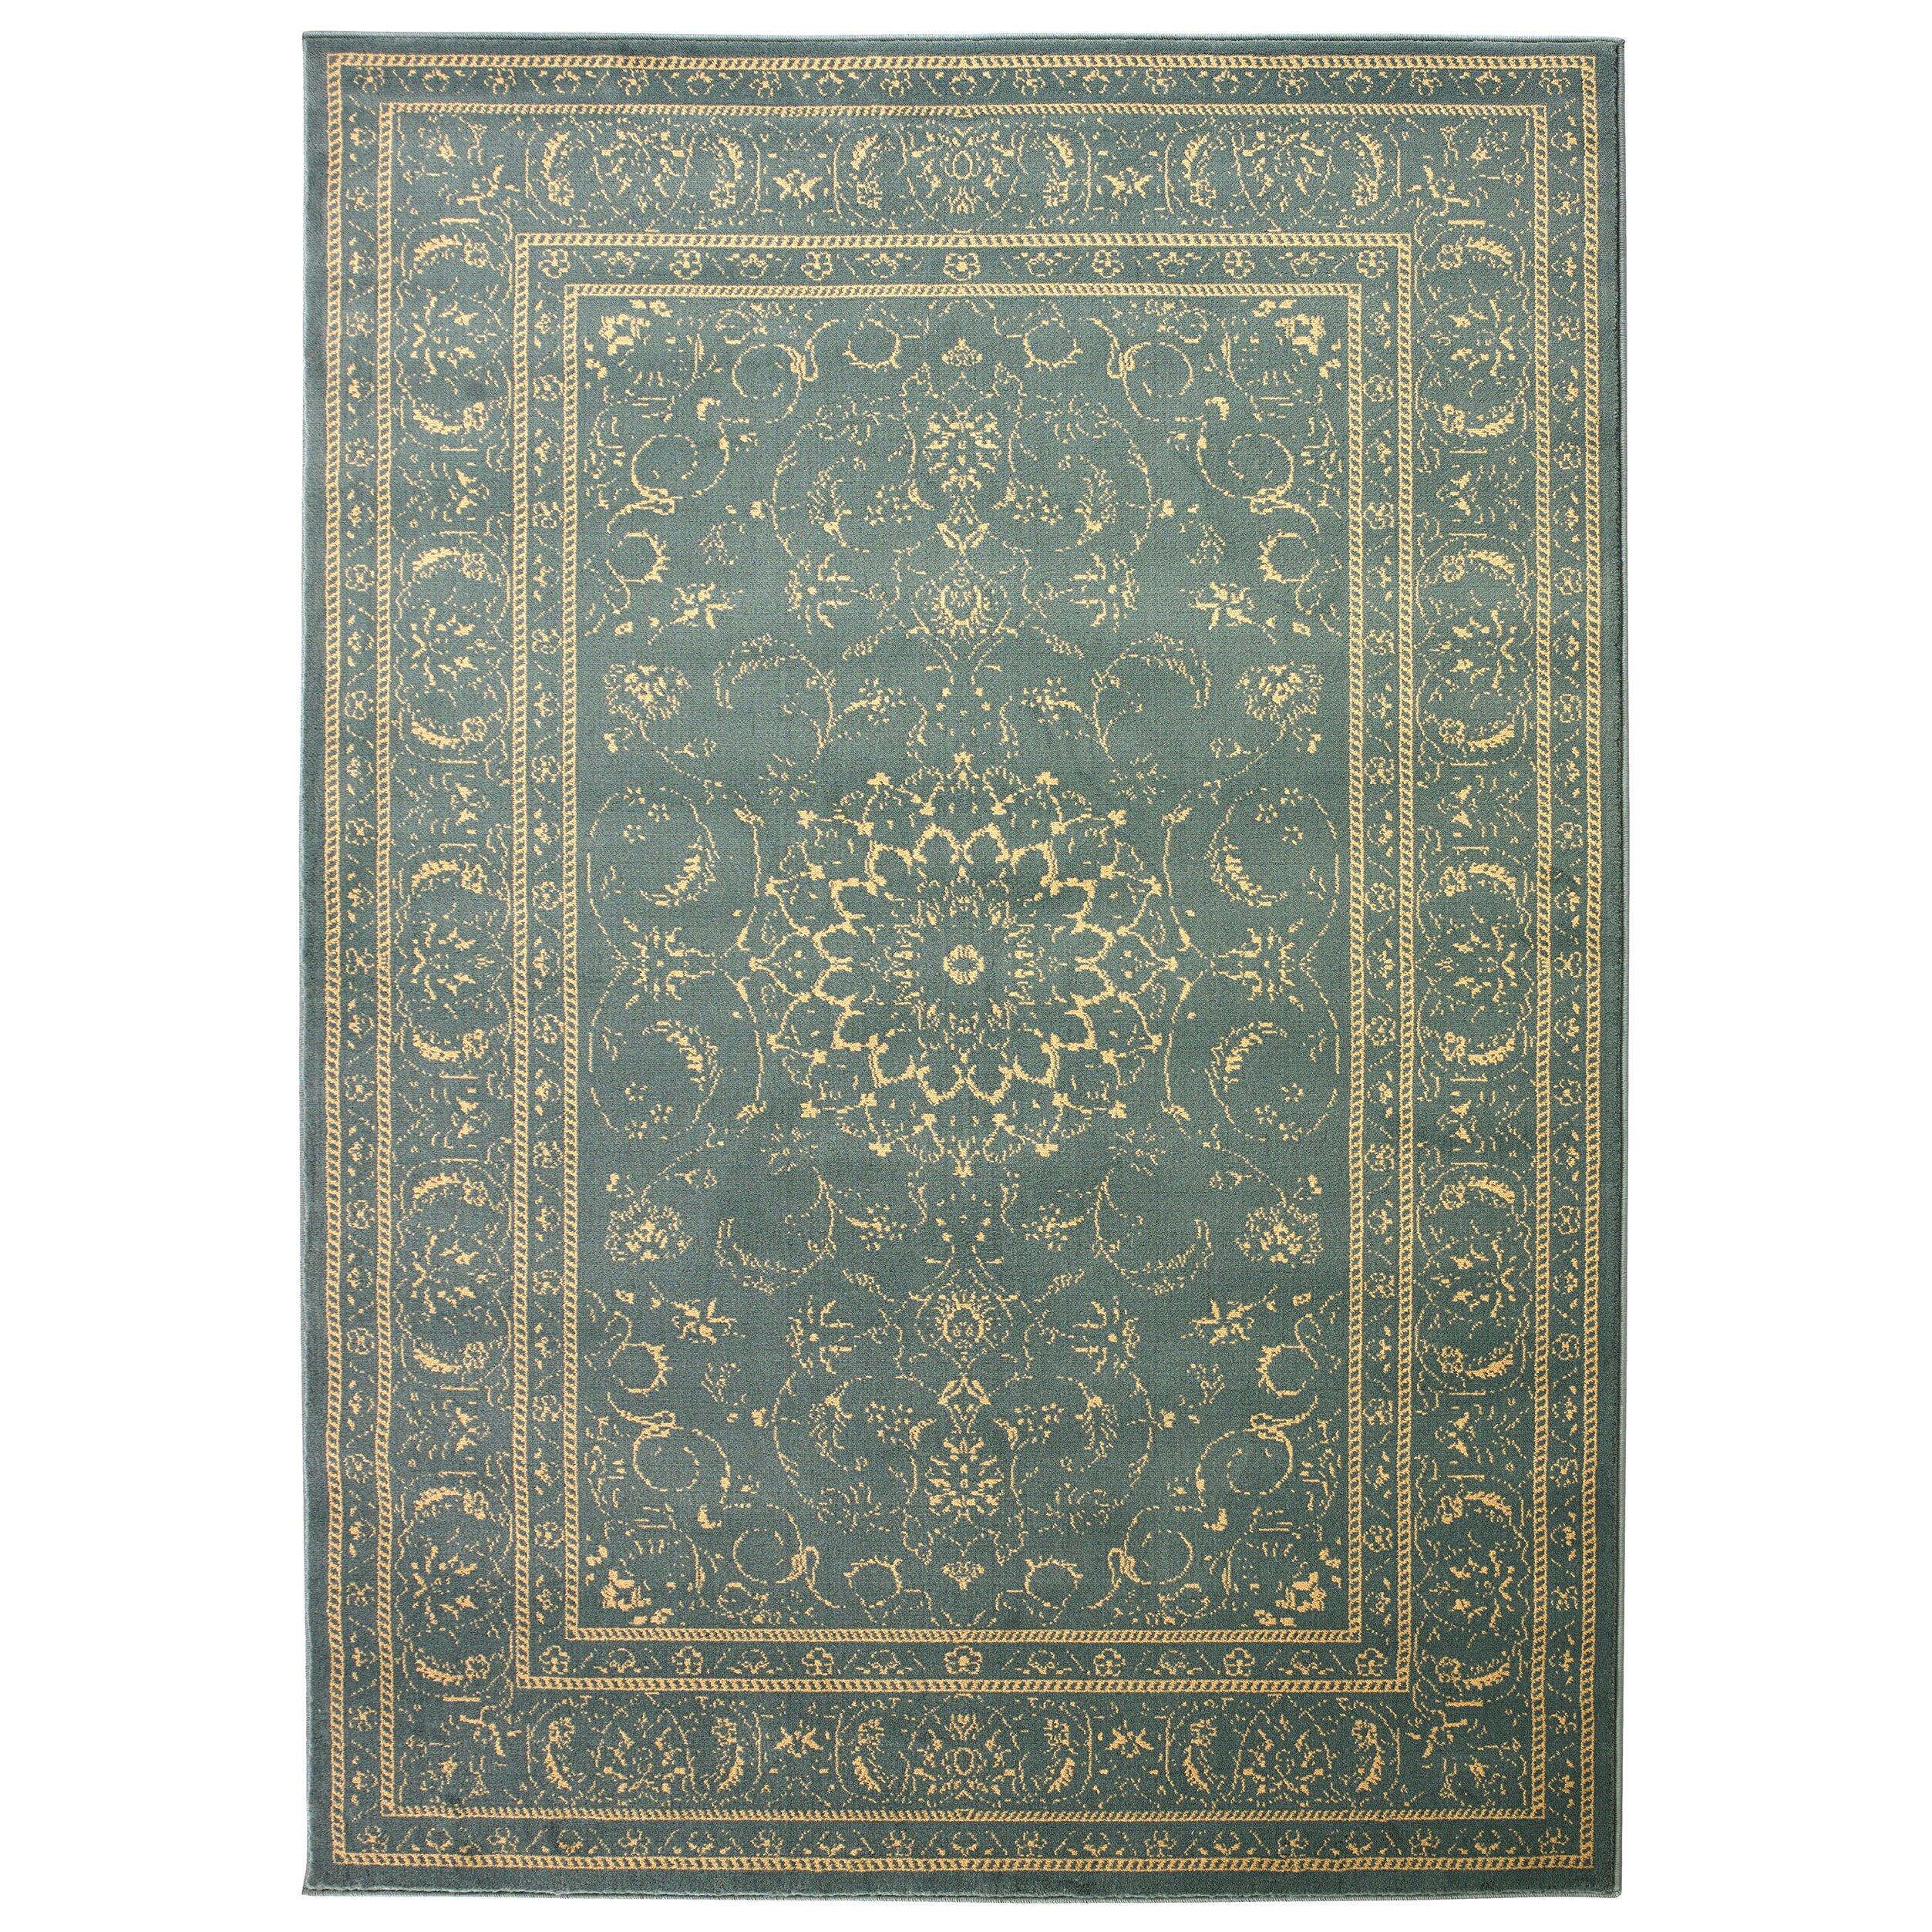 Diagona Designs Queen Teal/Beige Traditional Persian